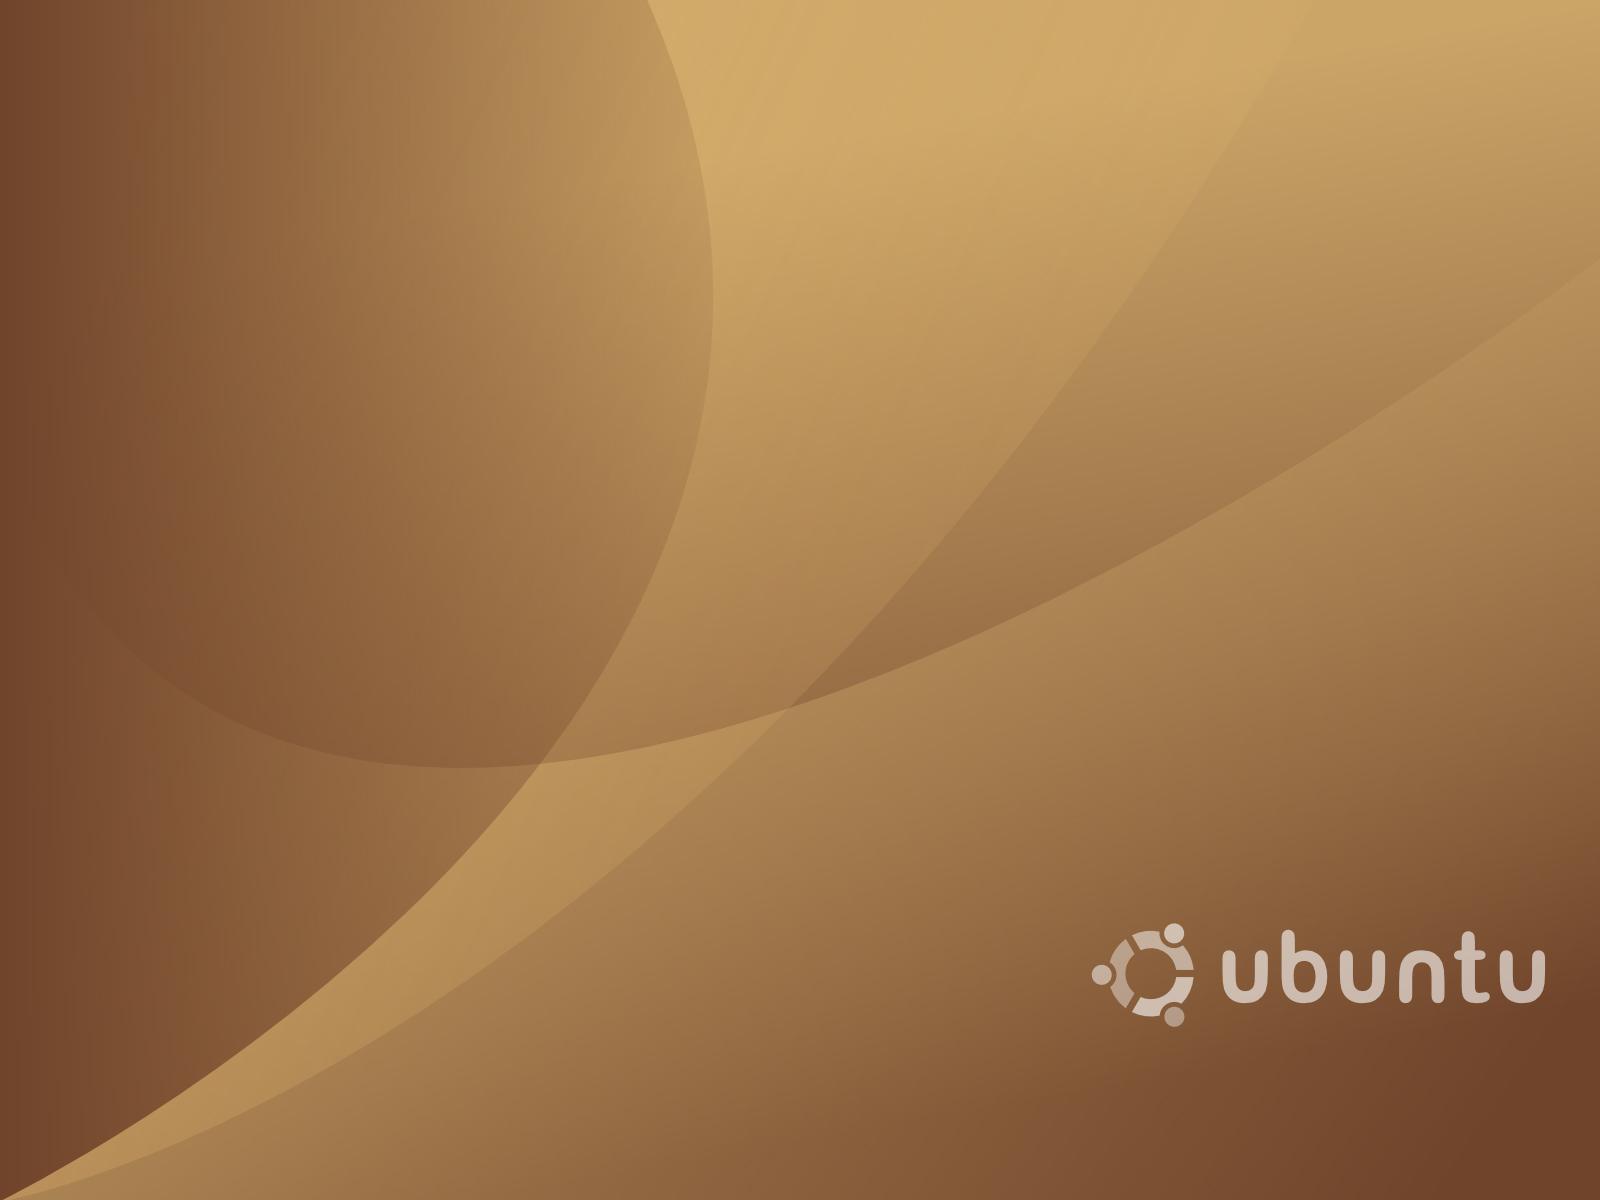 wallpaper Ubuntu Background hd wallpaper background desktop 1600x1200